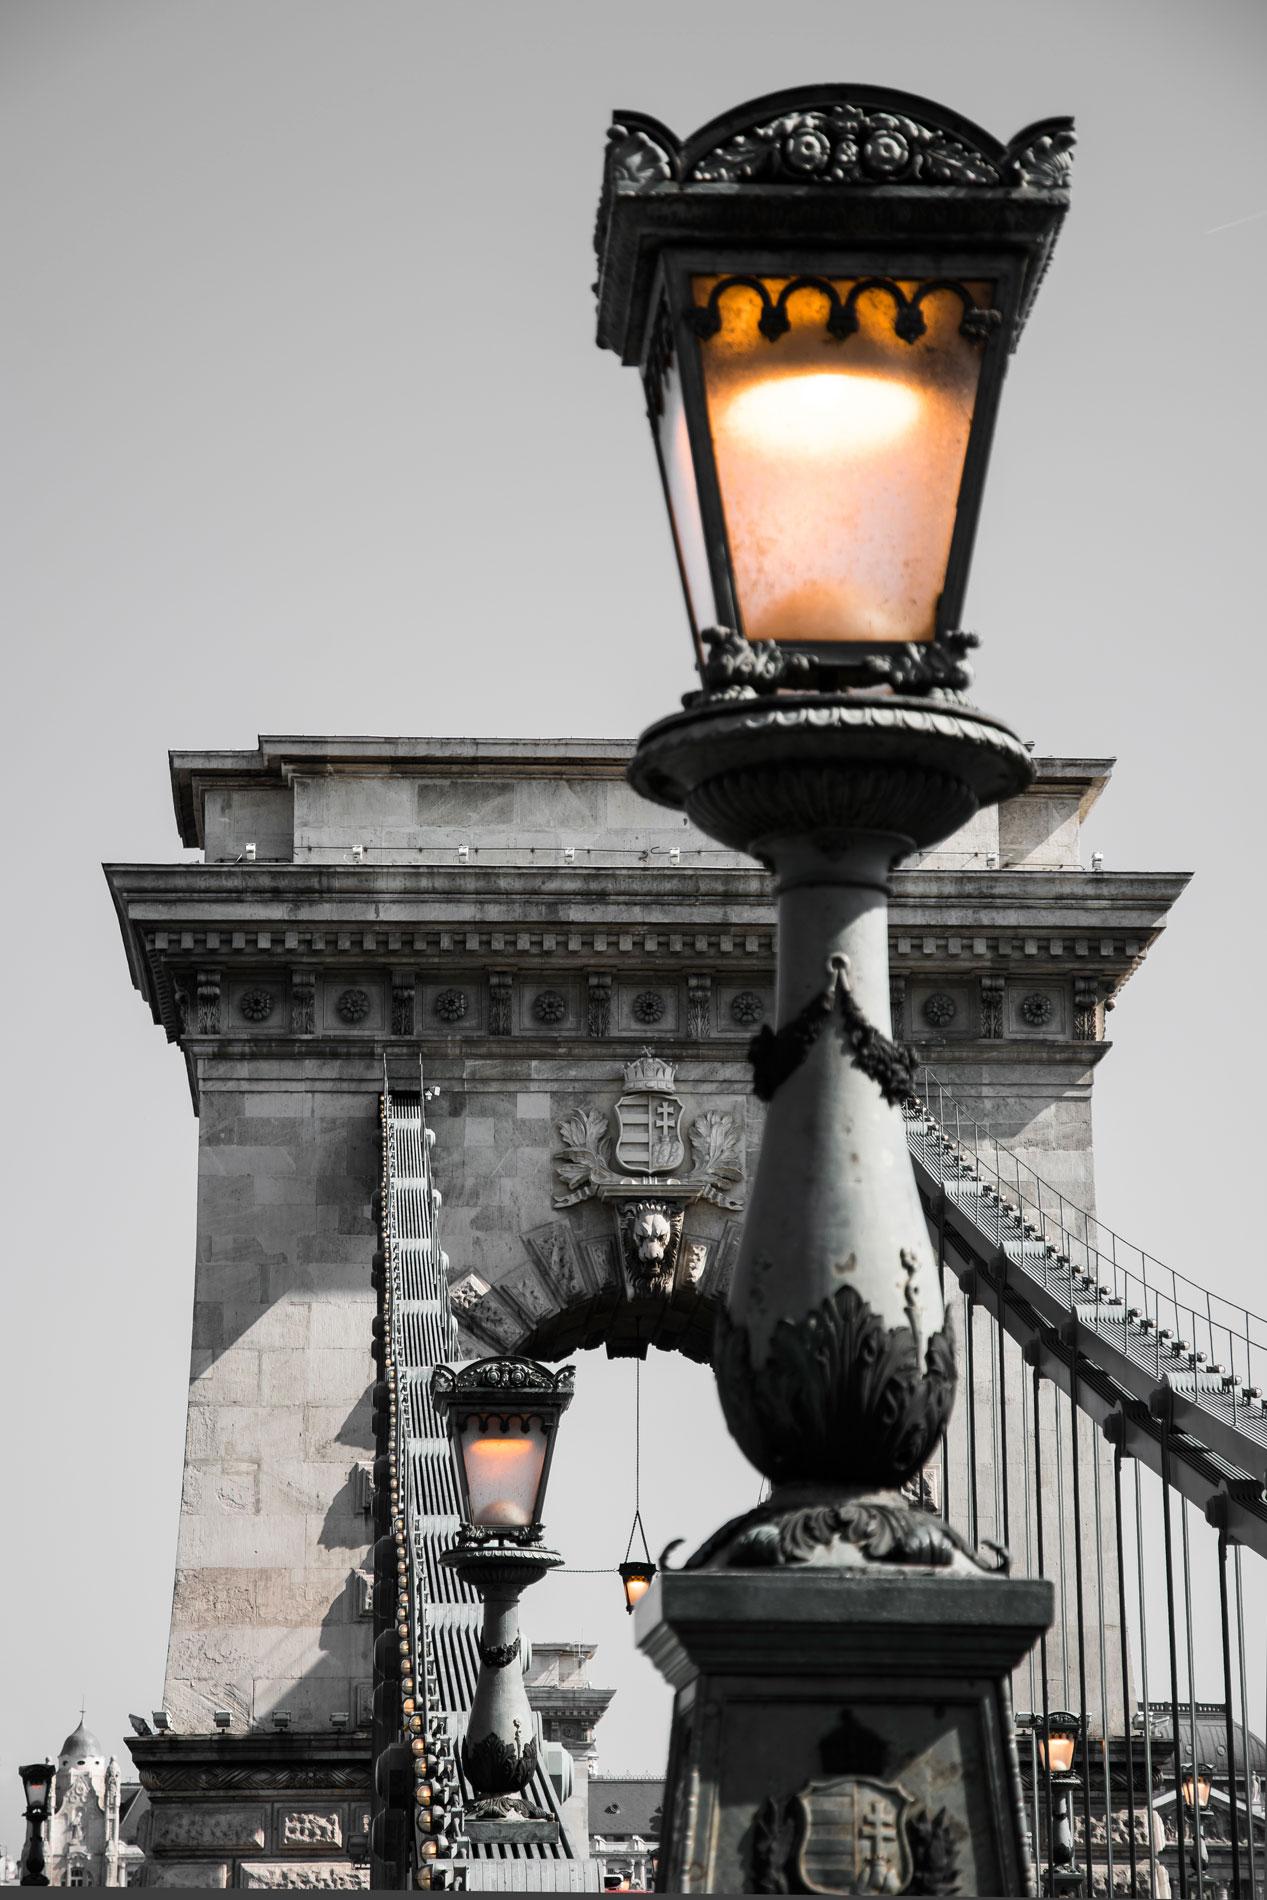 budapest_atthary_photography_bridge_26